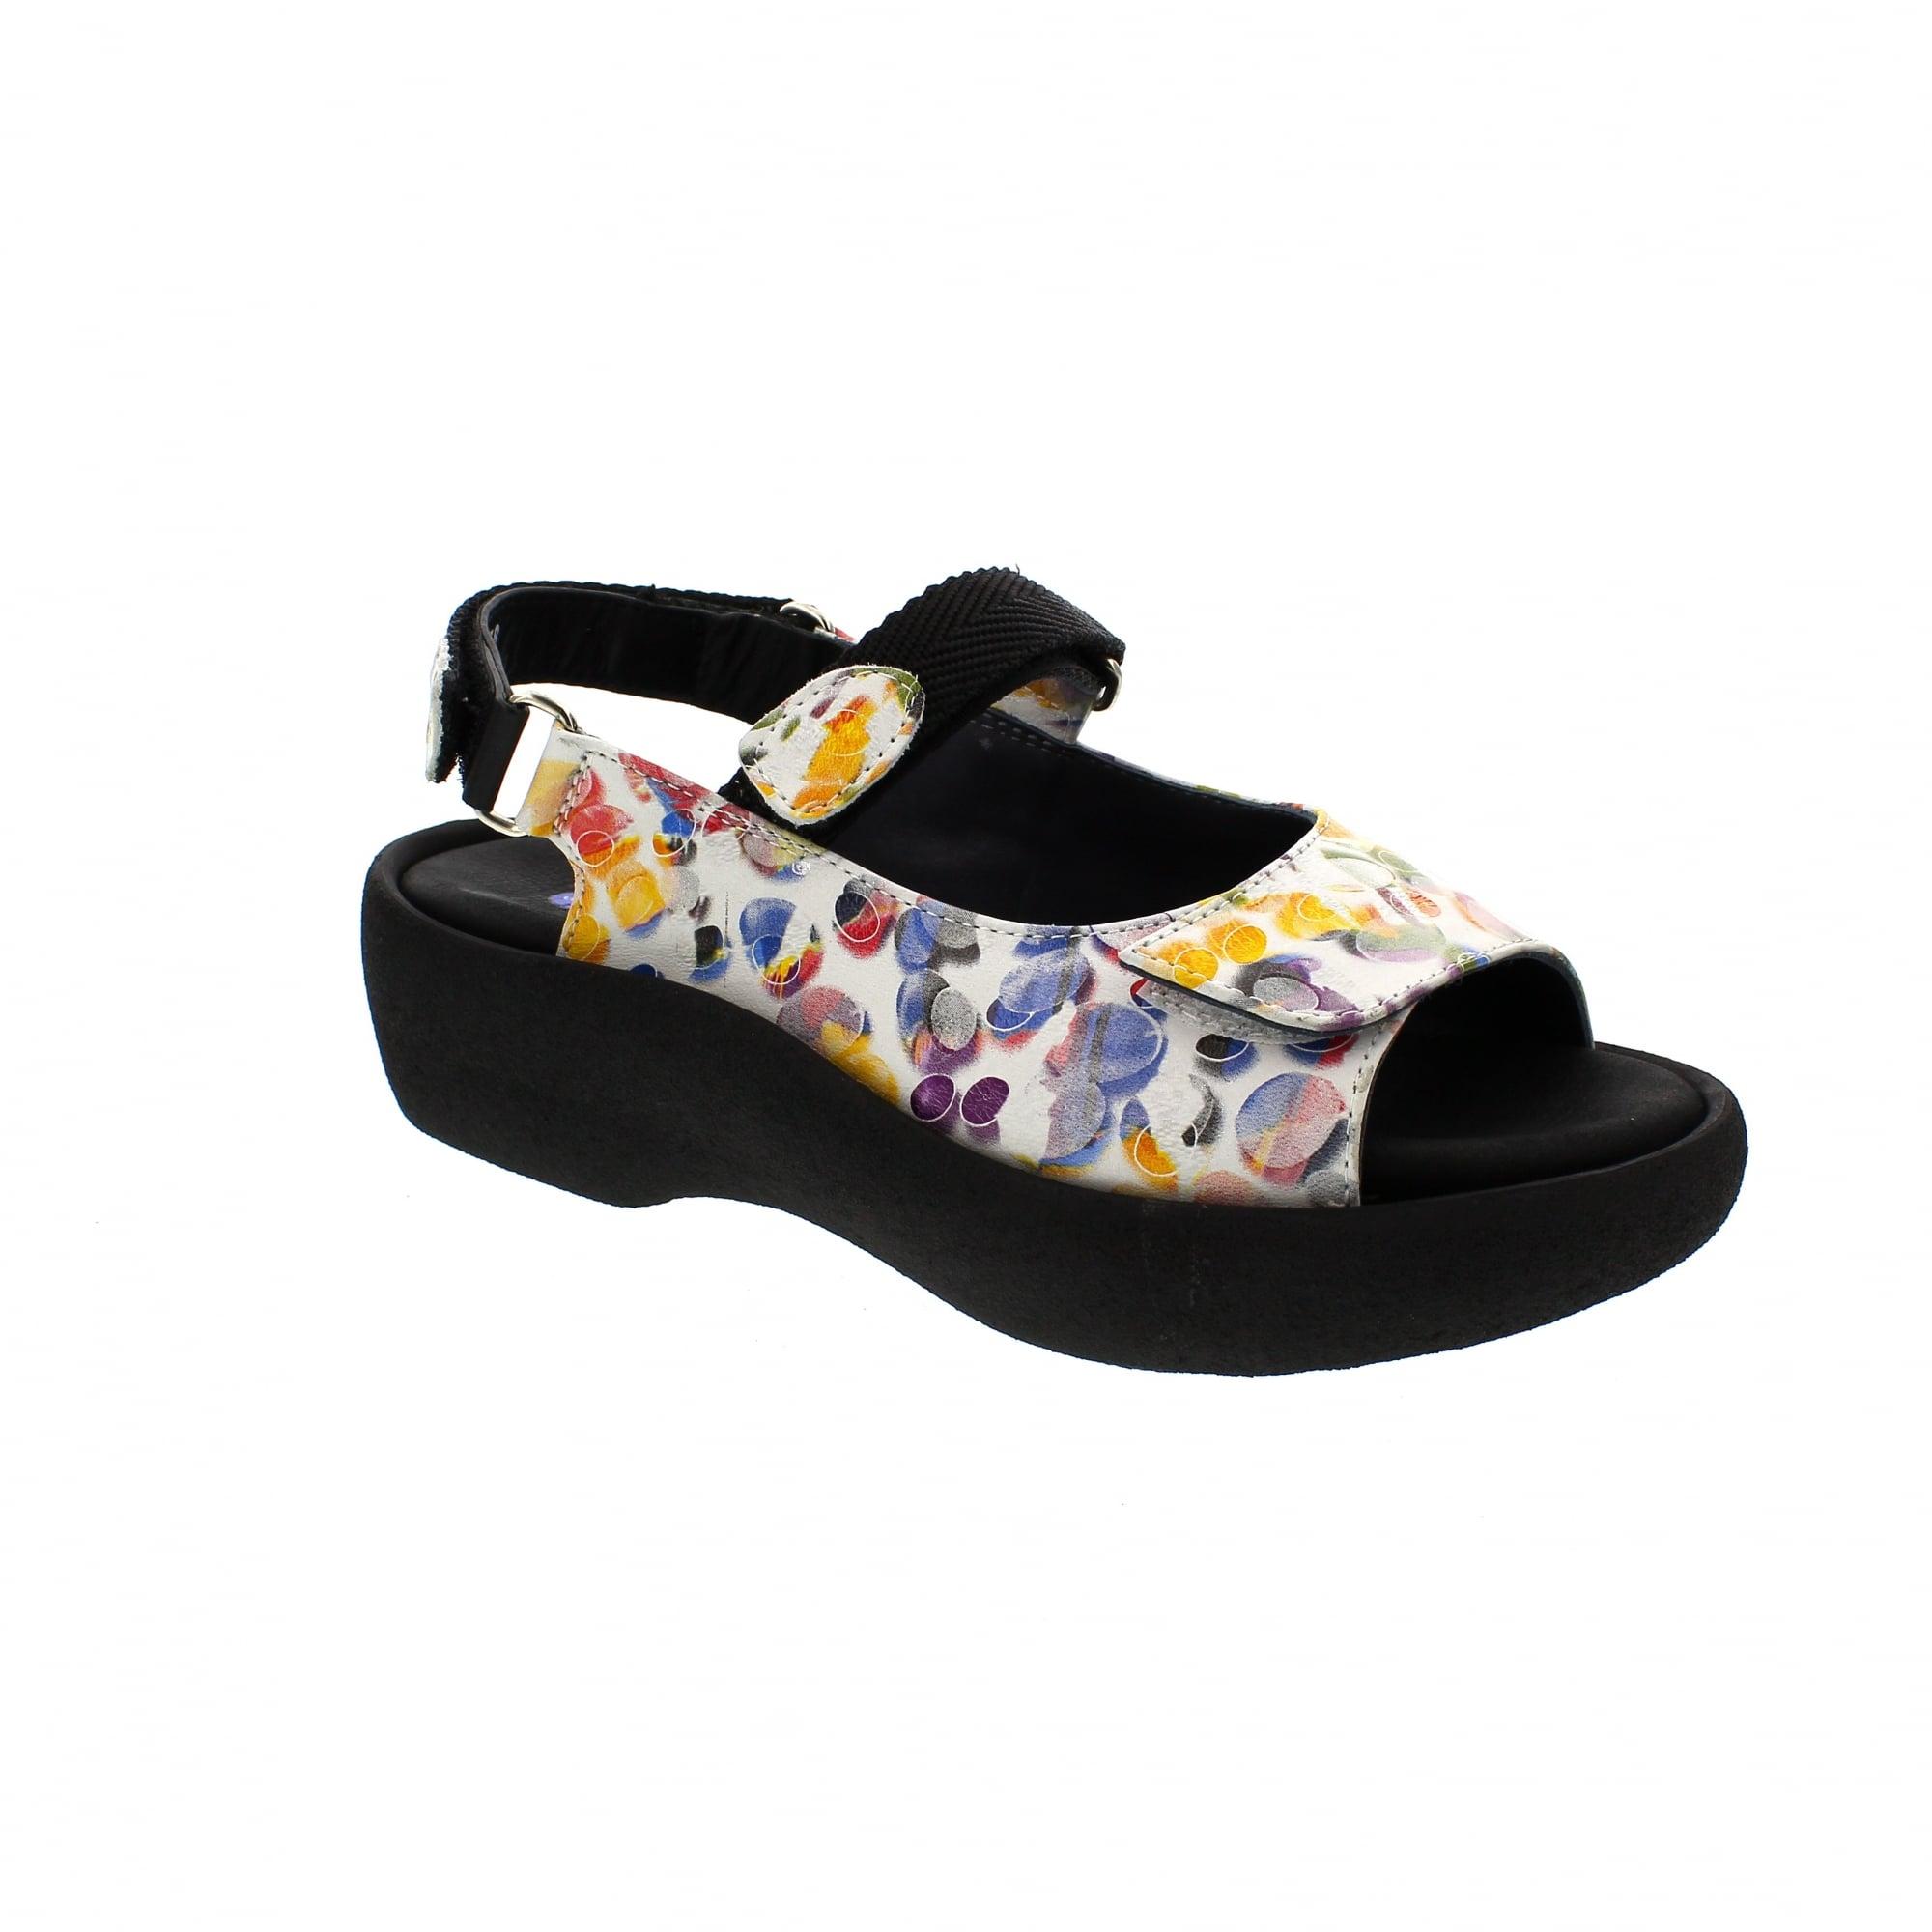 52c74b1d37 Wolky Jewel 03204-12-910 Womens Sandals